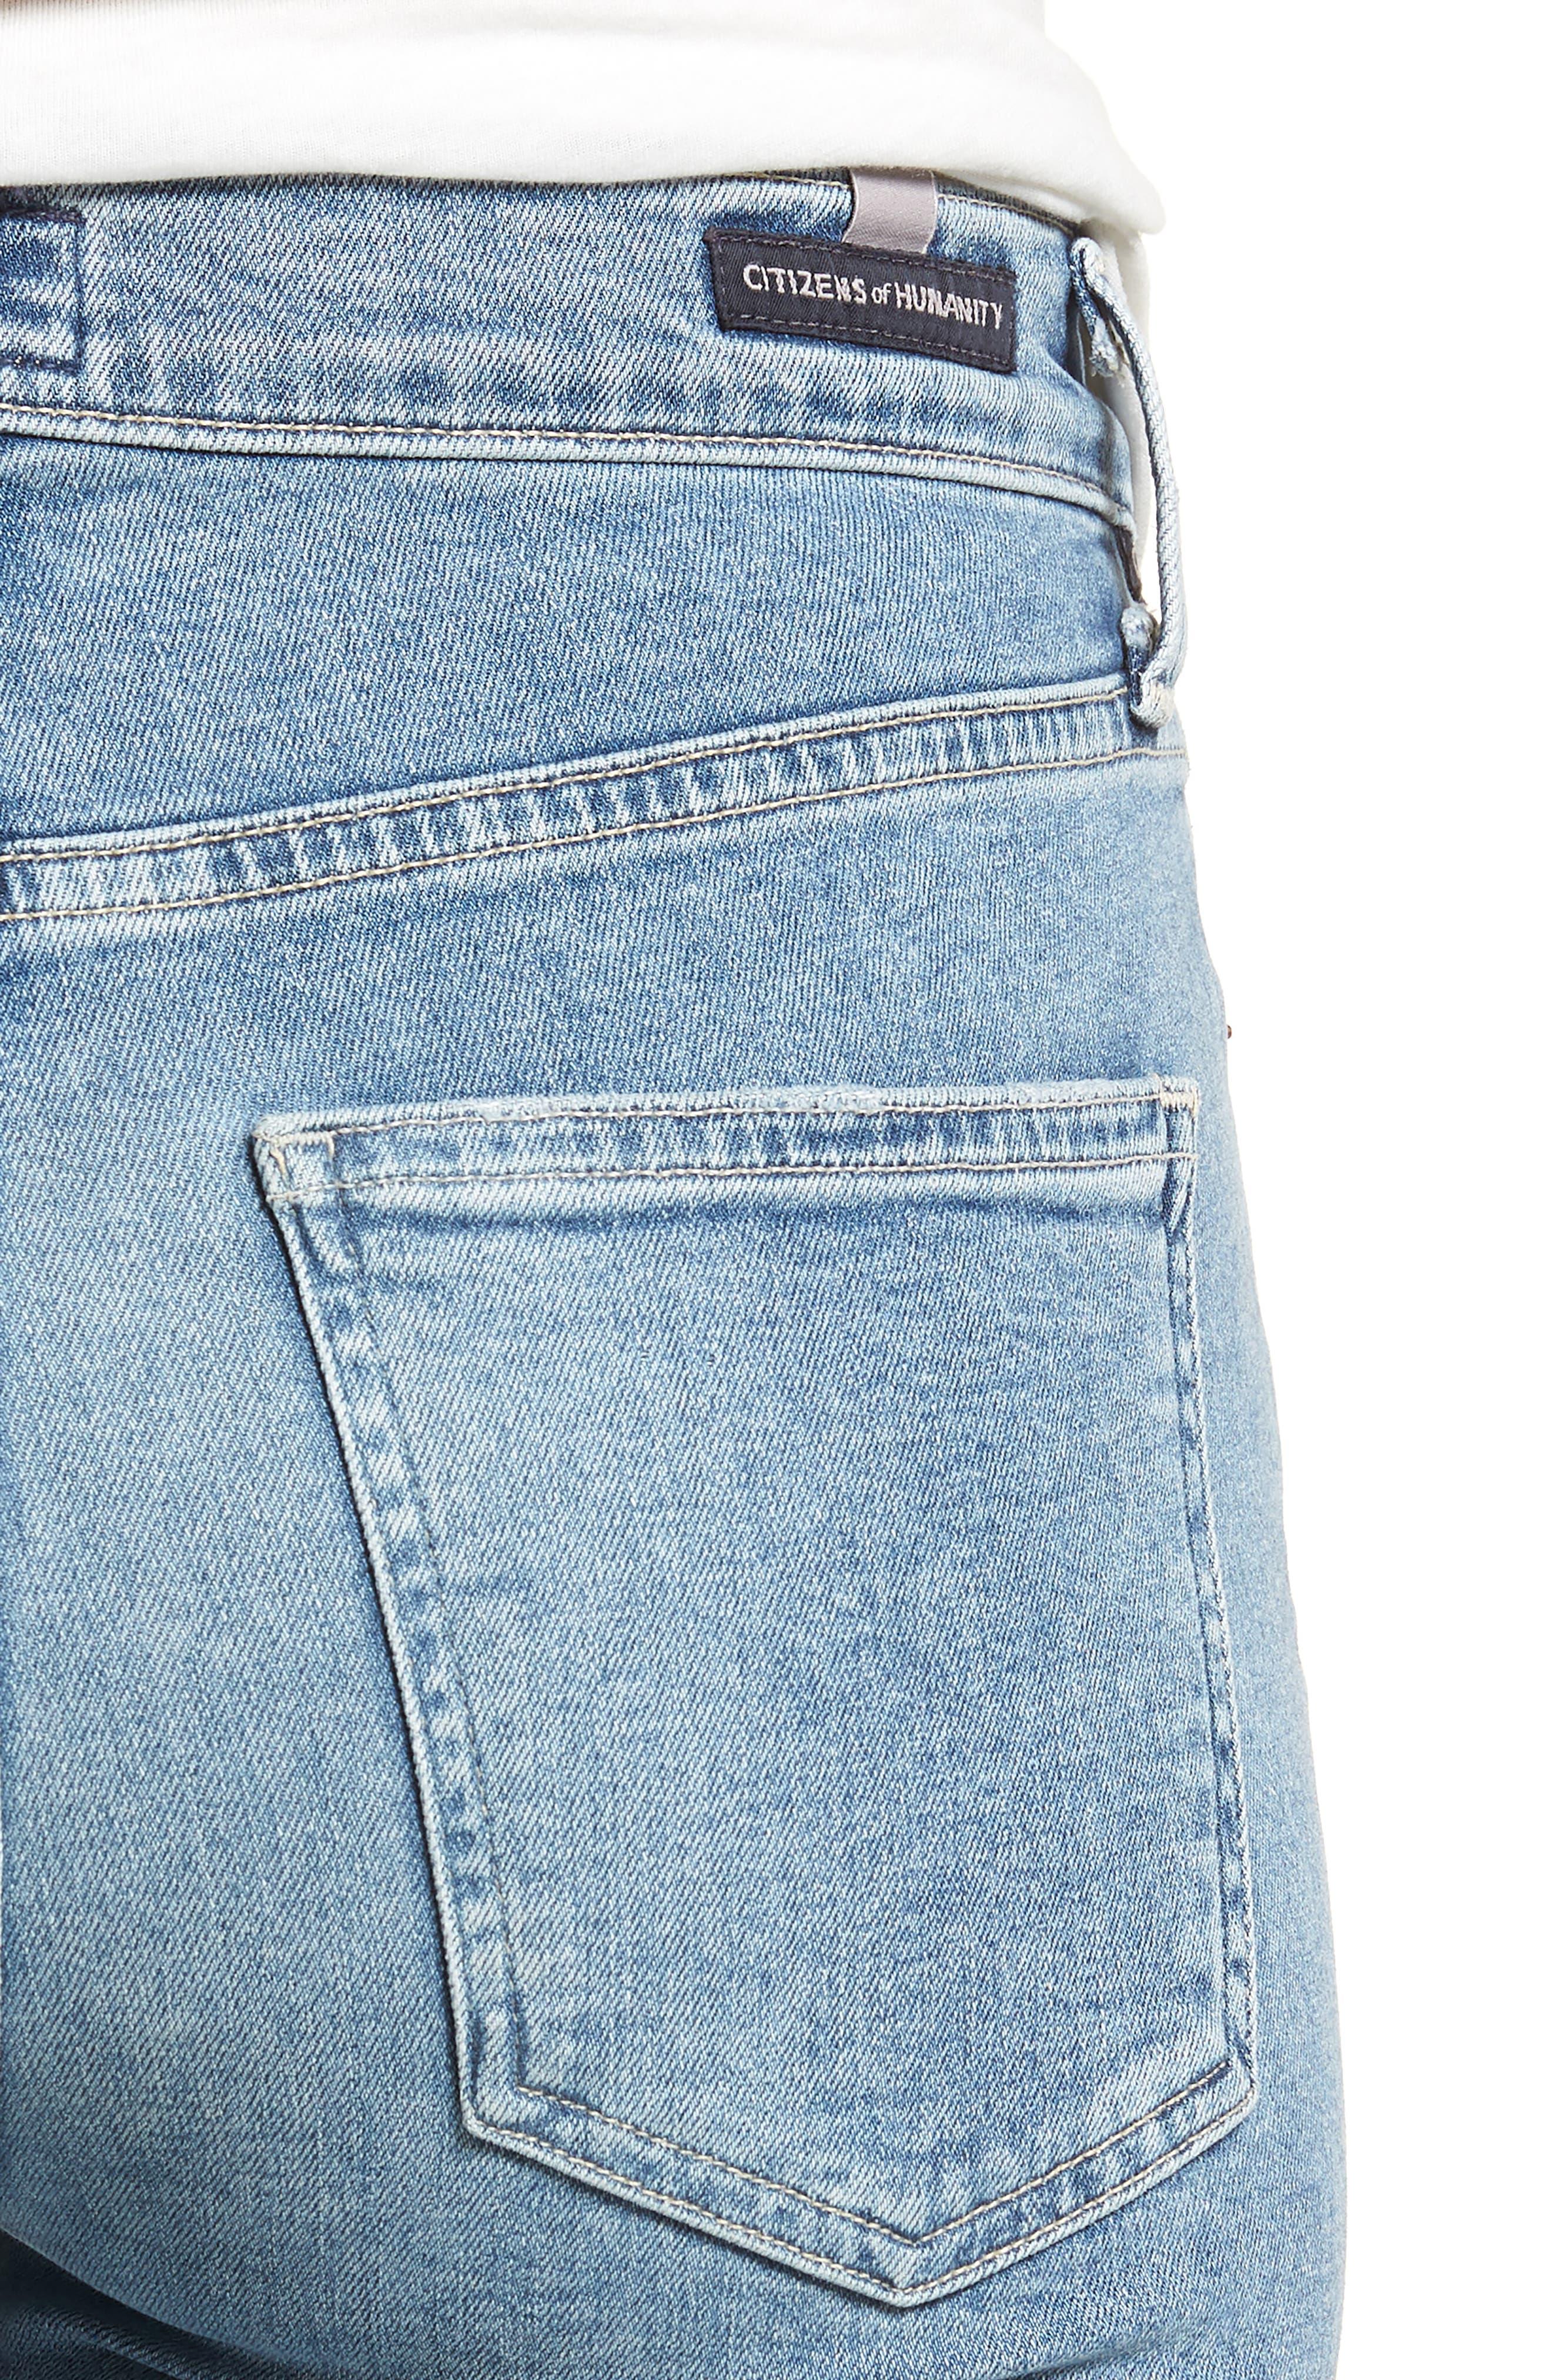 Rocket High Waist Crop Skinny Jeans,                             Alternate thumbnail 4, color,                             Firestone